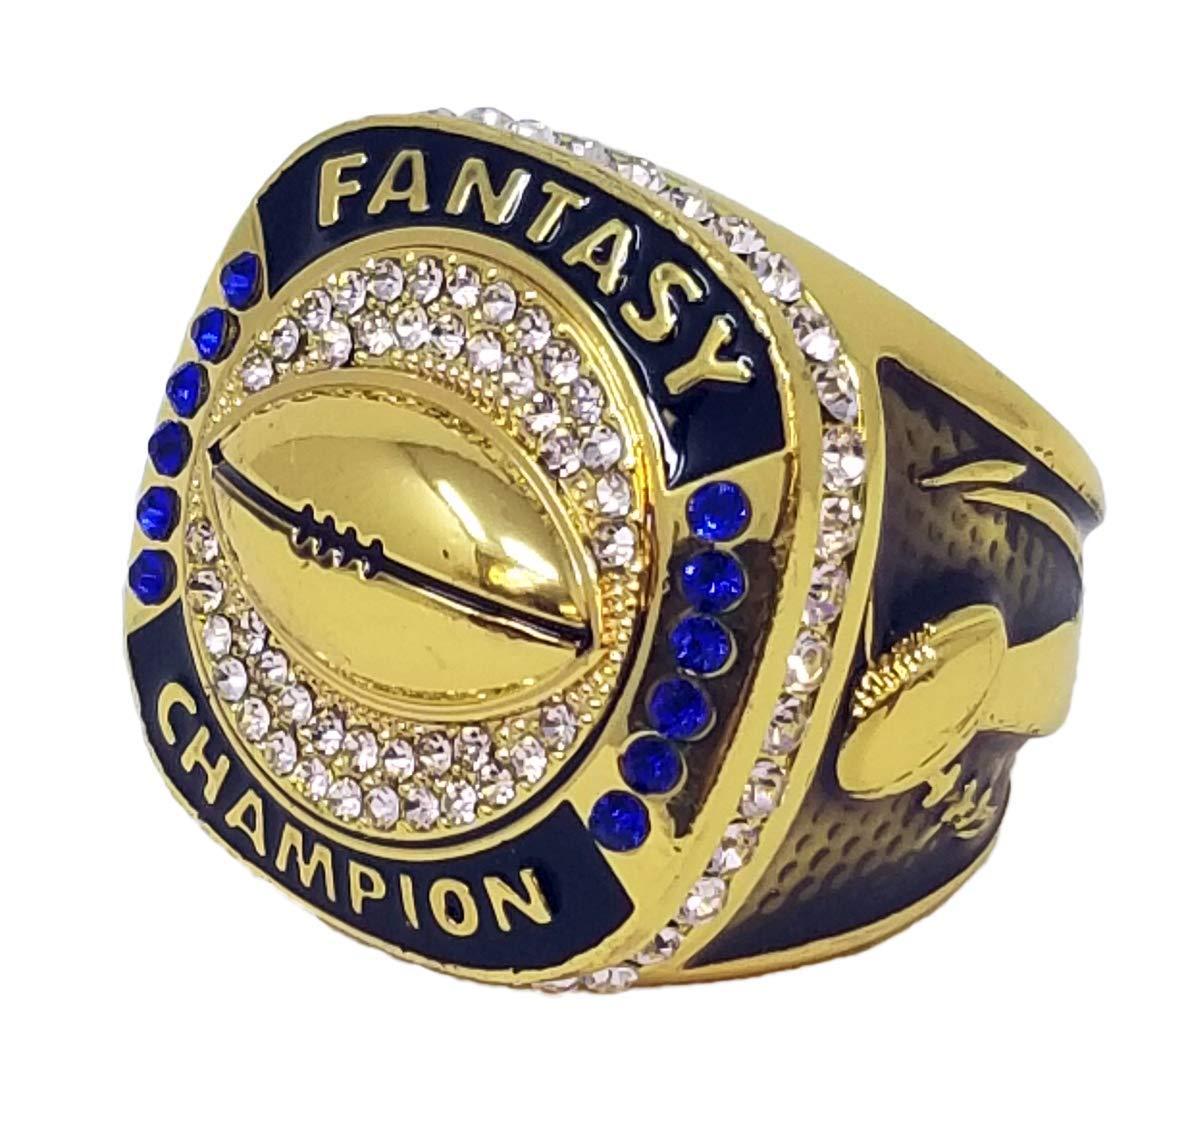 Decade Awardsゴールドファンタジーフットボールチャンピオンリング スタイルB ヘビーFFL リーグチャンピオンリング スタンド付き B07H7VC7ST  12